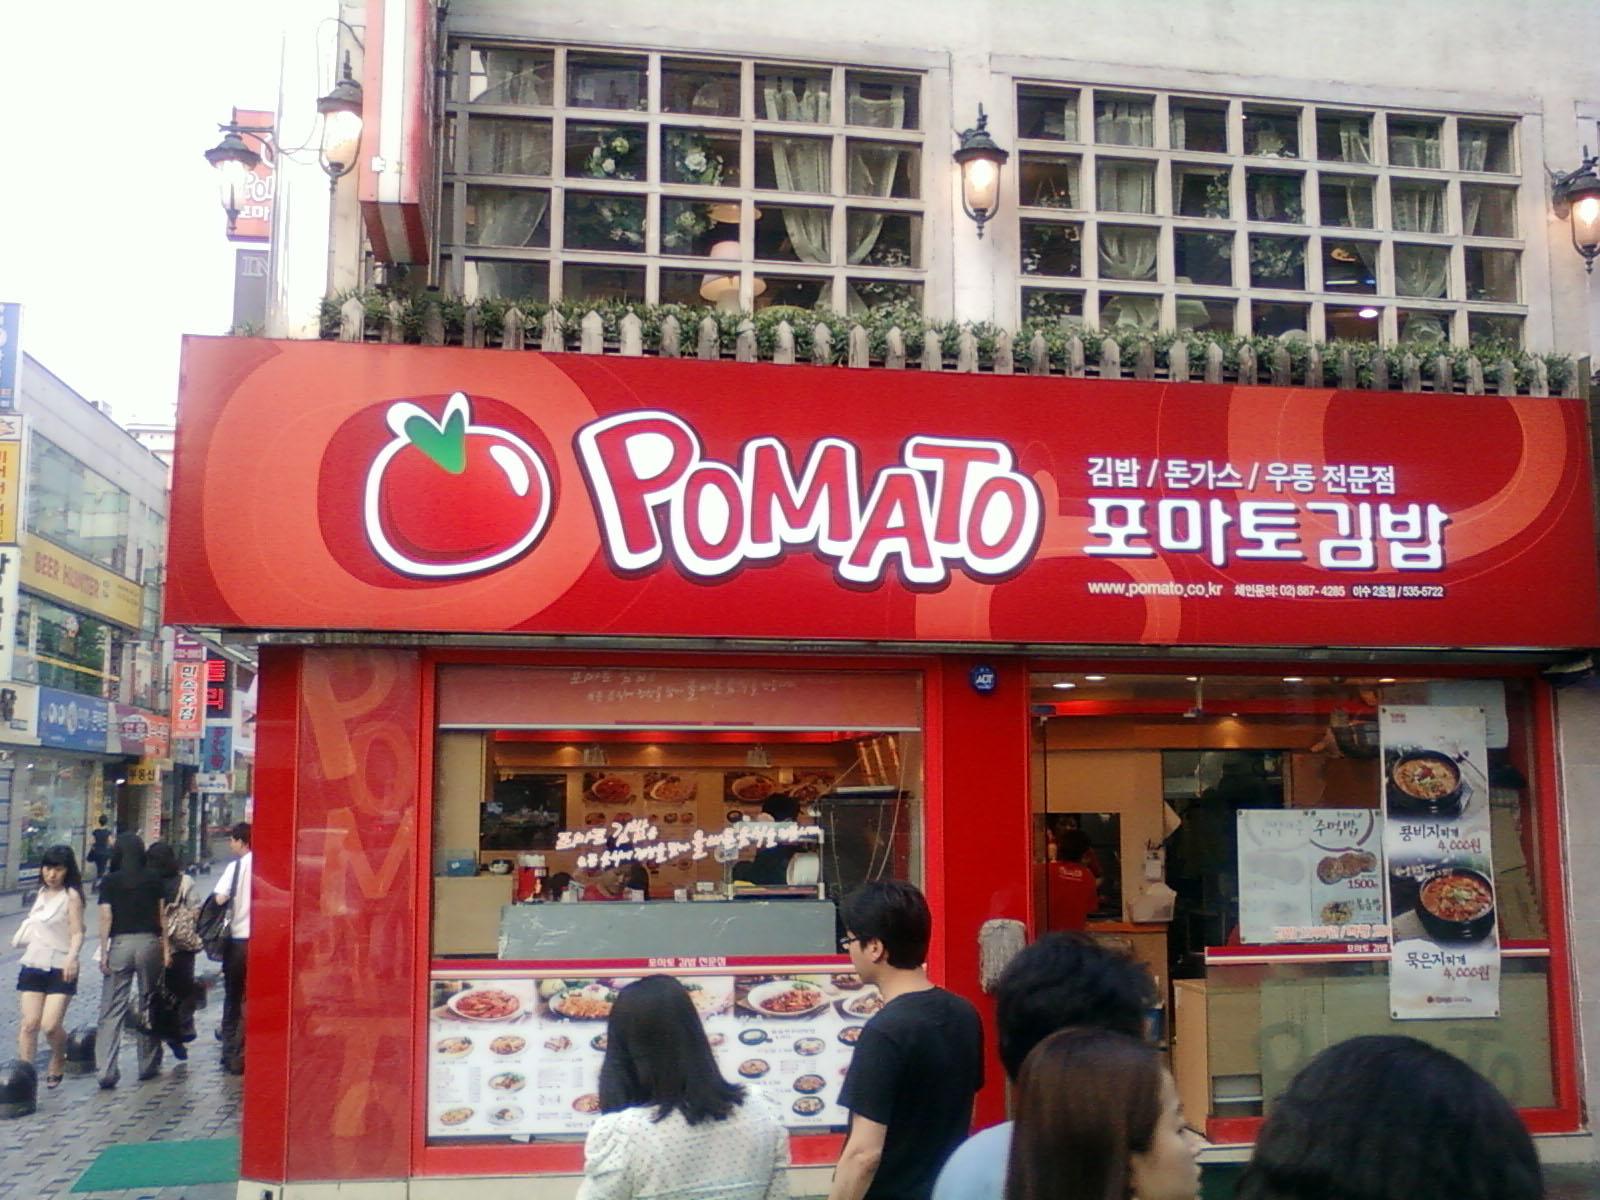 Seoul Pomato